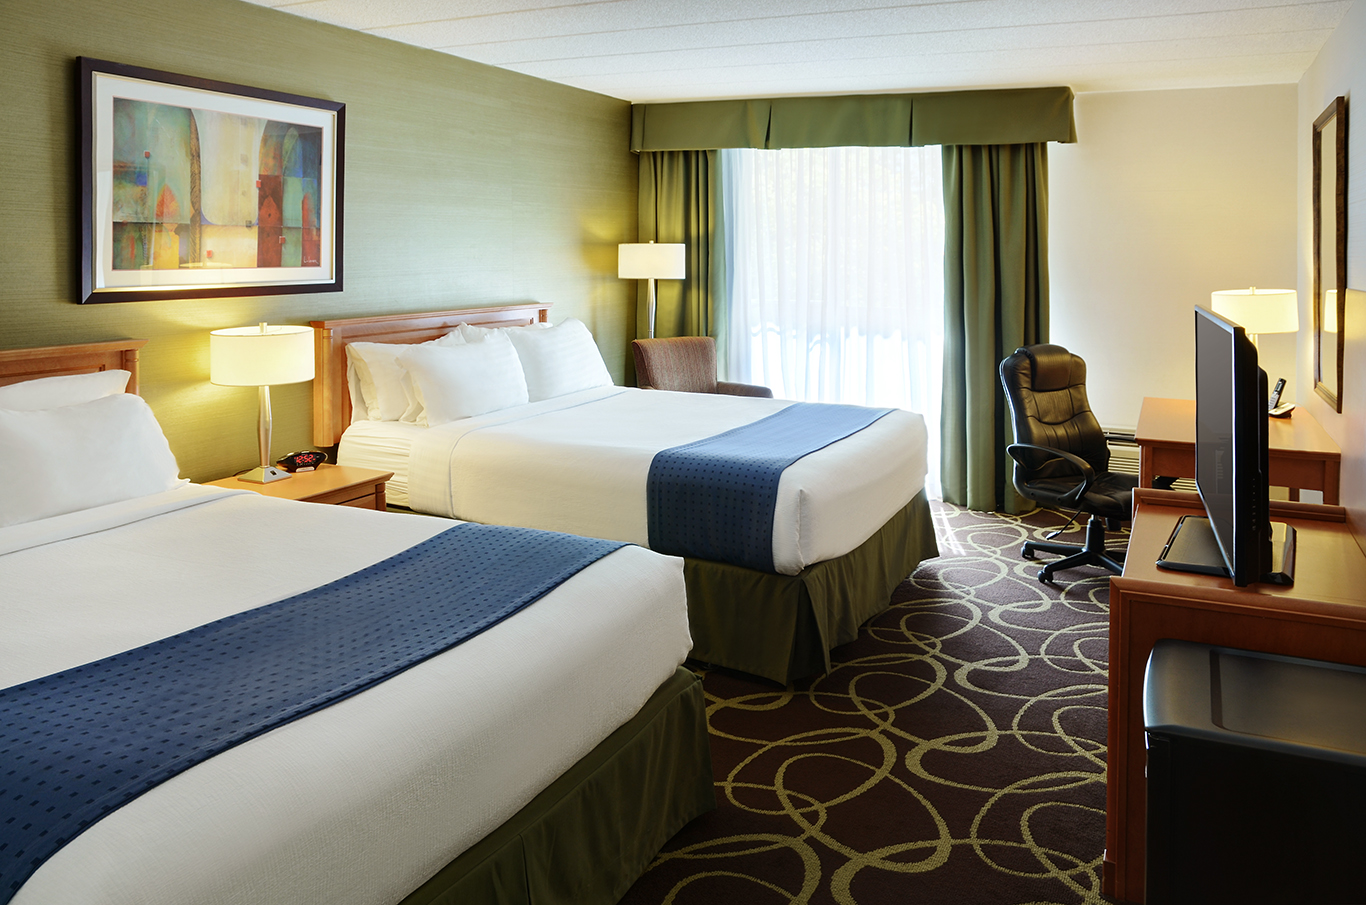 Sunbridge Sarnia Hotel and Conference Center (formerly the Holiday Inn Sarnia/Point Edward)